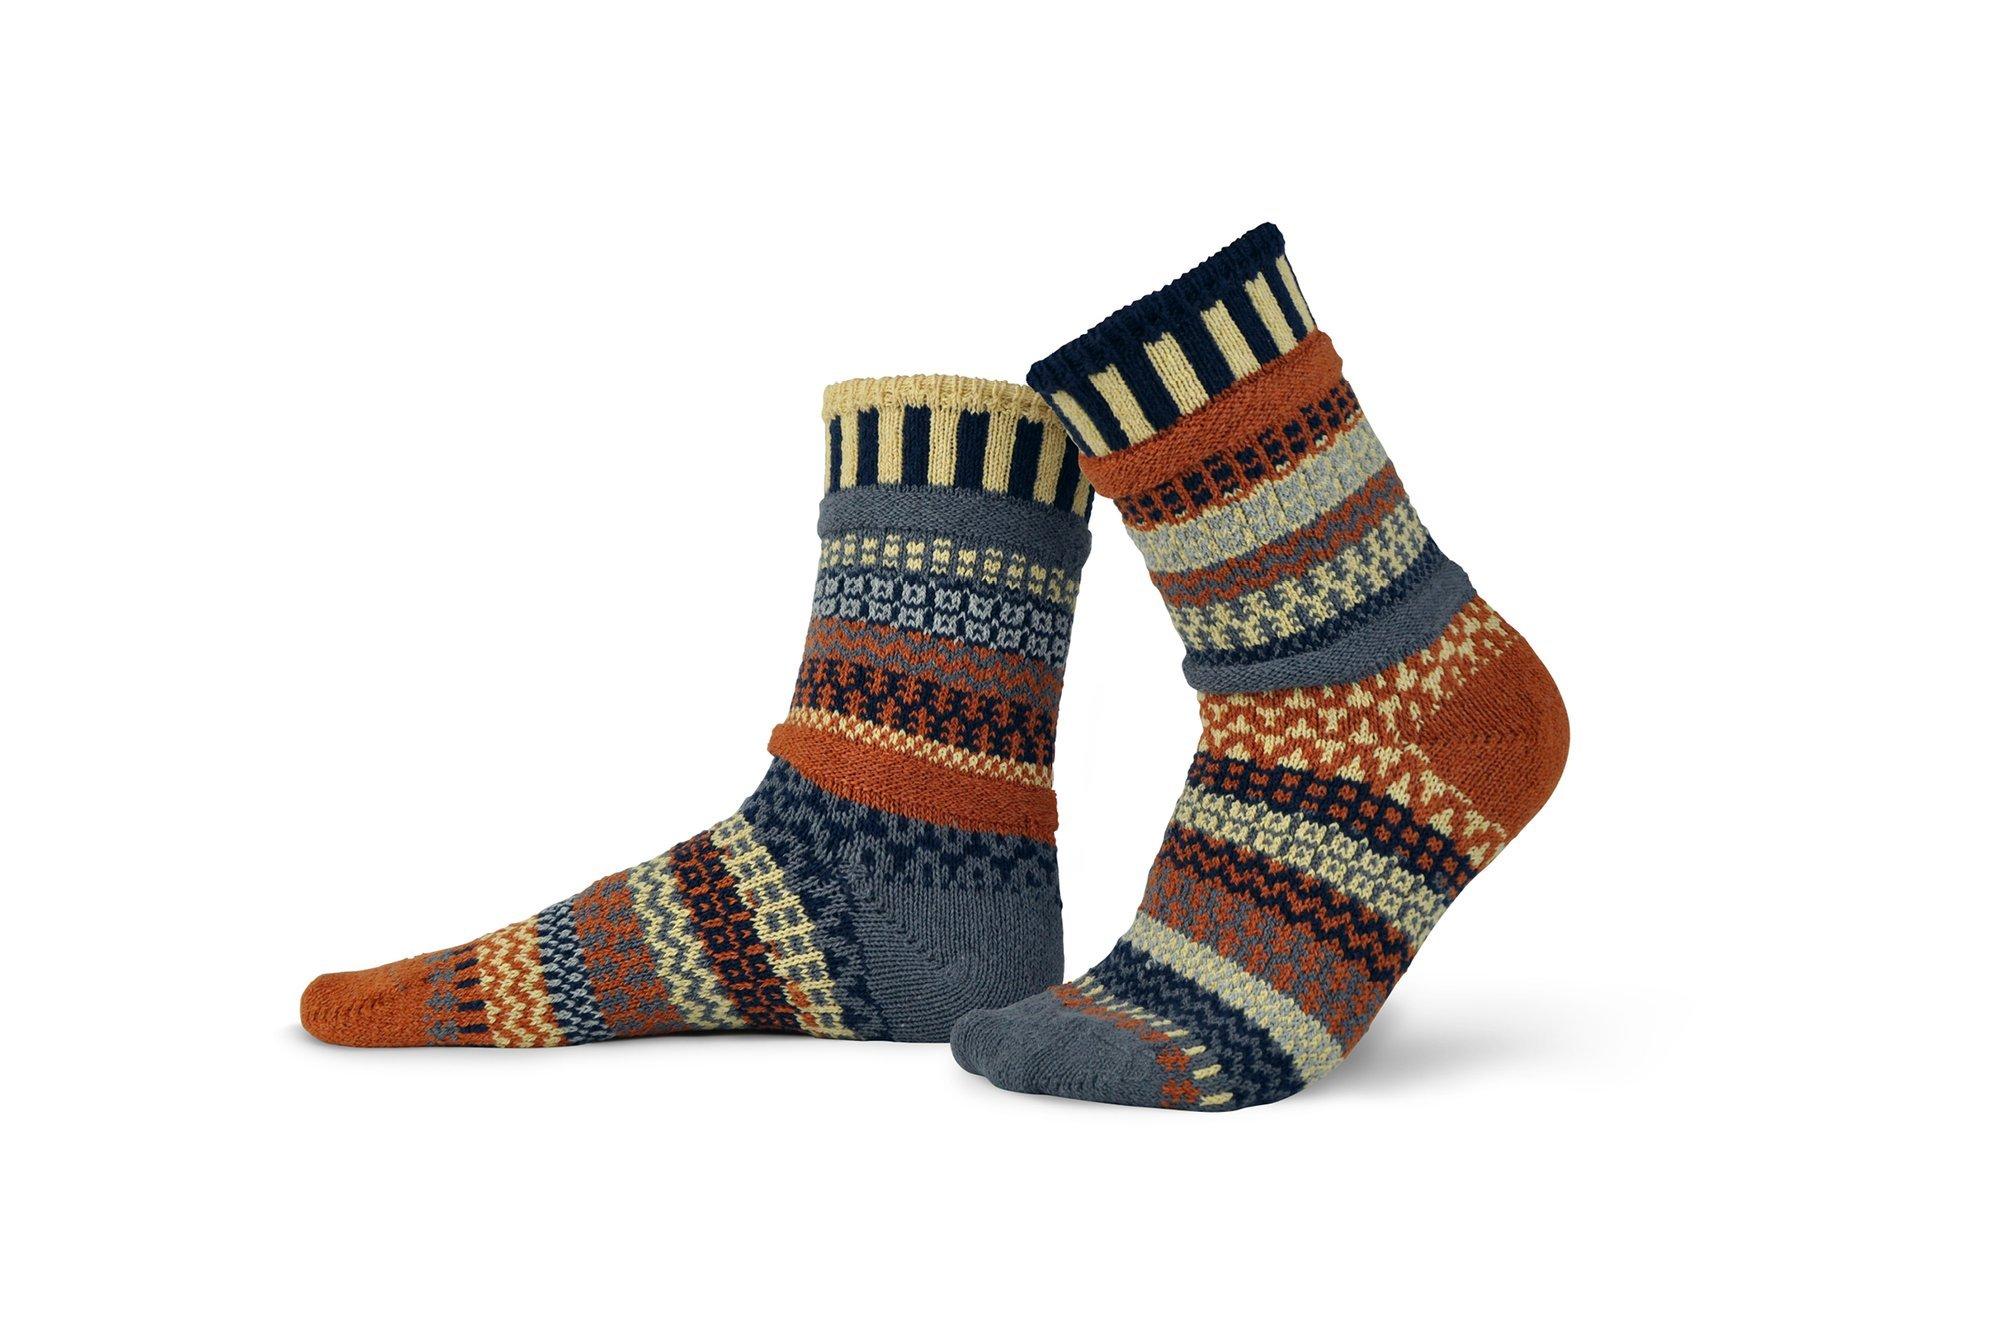 Solmate Crew Socks Nutmeg